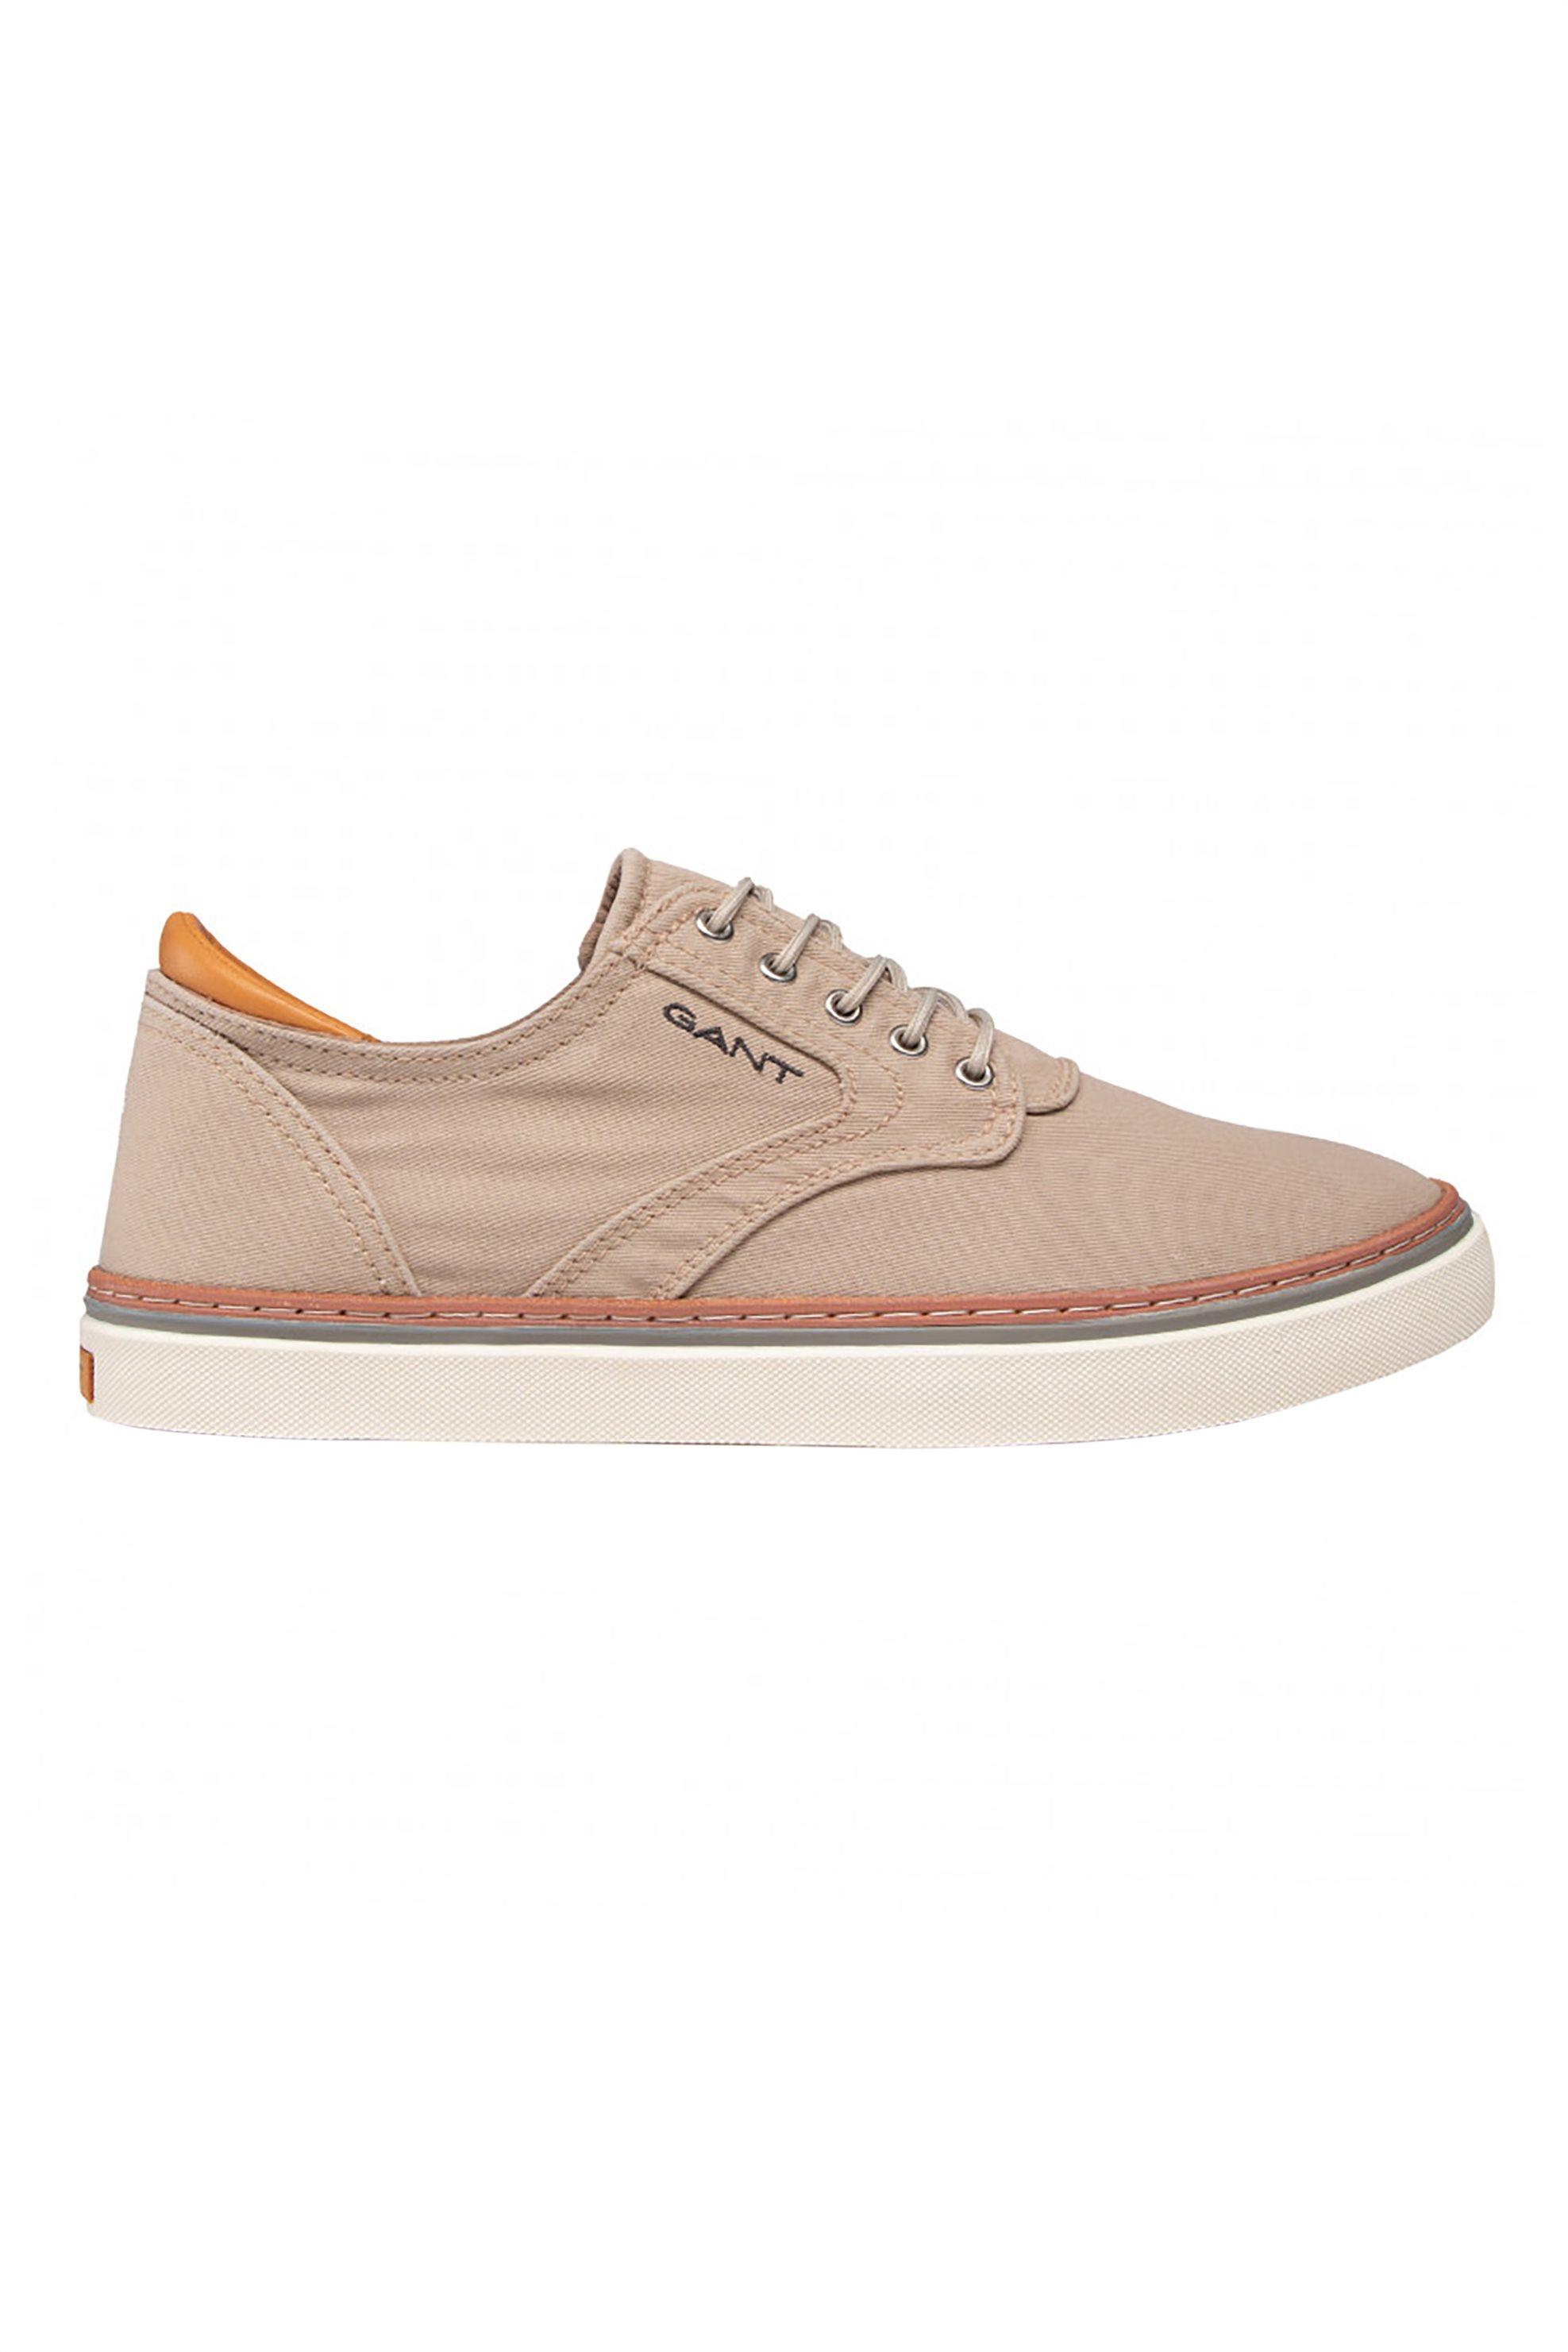 "Gant ανδρικά sneakers με logo print στο πλάι και δερμάτινες λεπτομέρειες ""Prepville"" – 22638668 – Μπεζ"